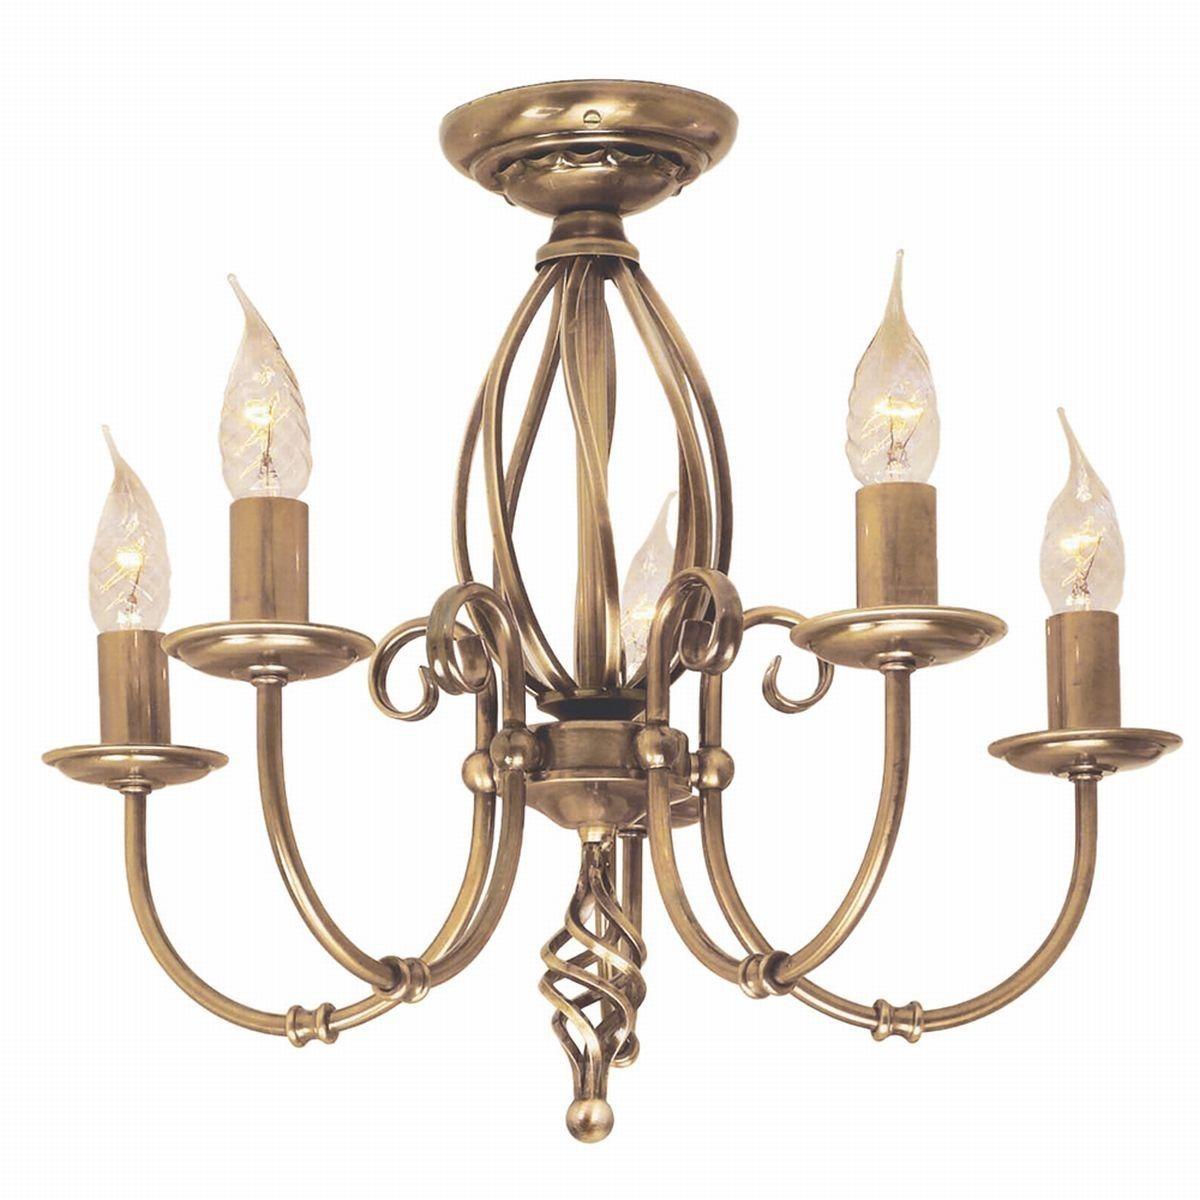 Artisan Aged Brass - Elstead Lighting - lampa wisząca klasyczna